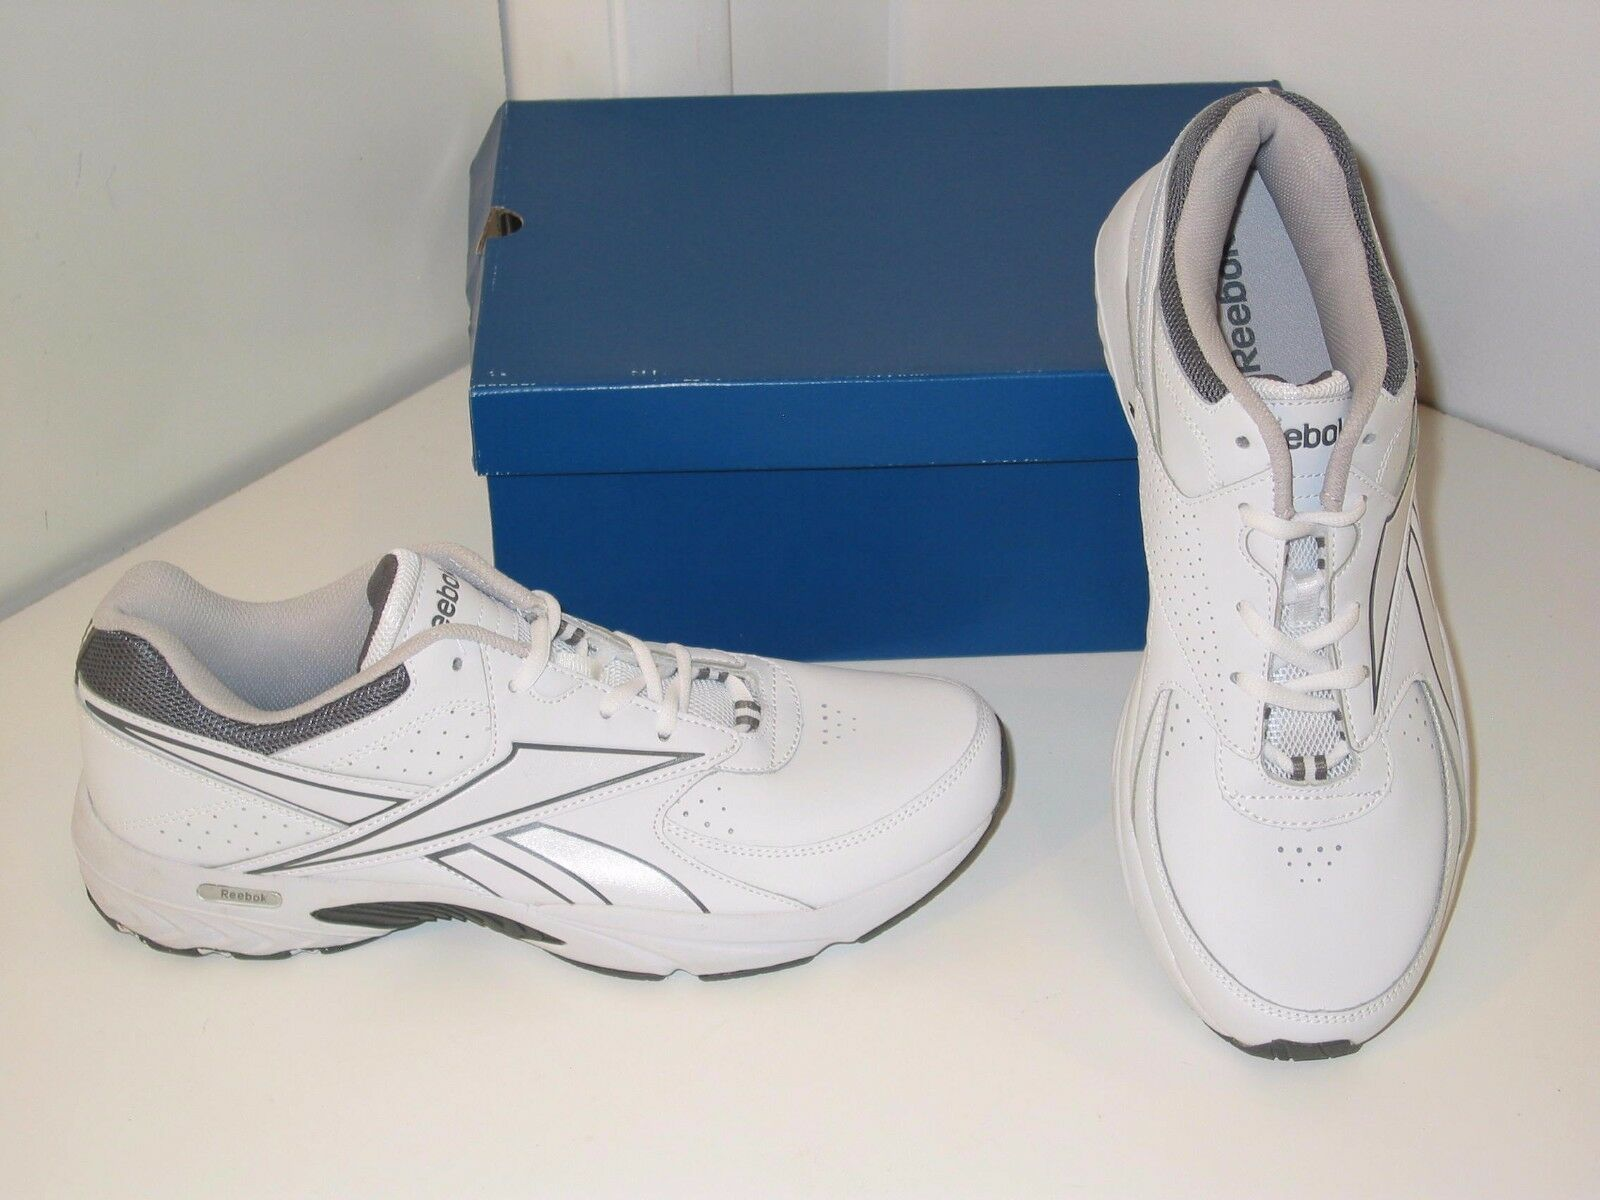 Reebok Walk Walk Walk Around Walking Training Weiß Leather Turnschuhe schuhe Mens 11 02f7f2